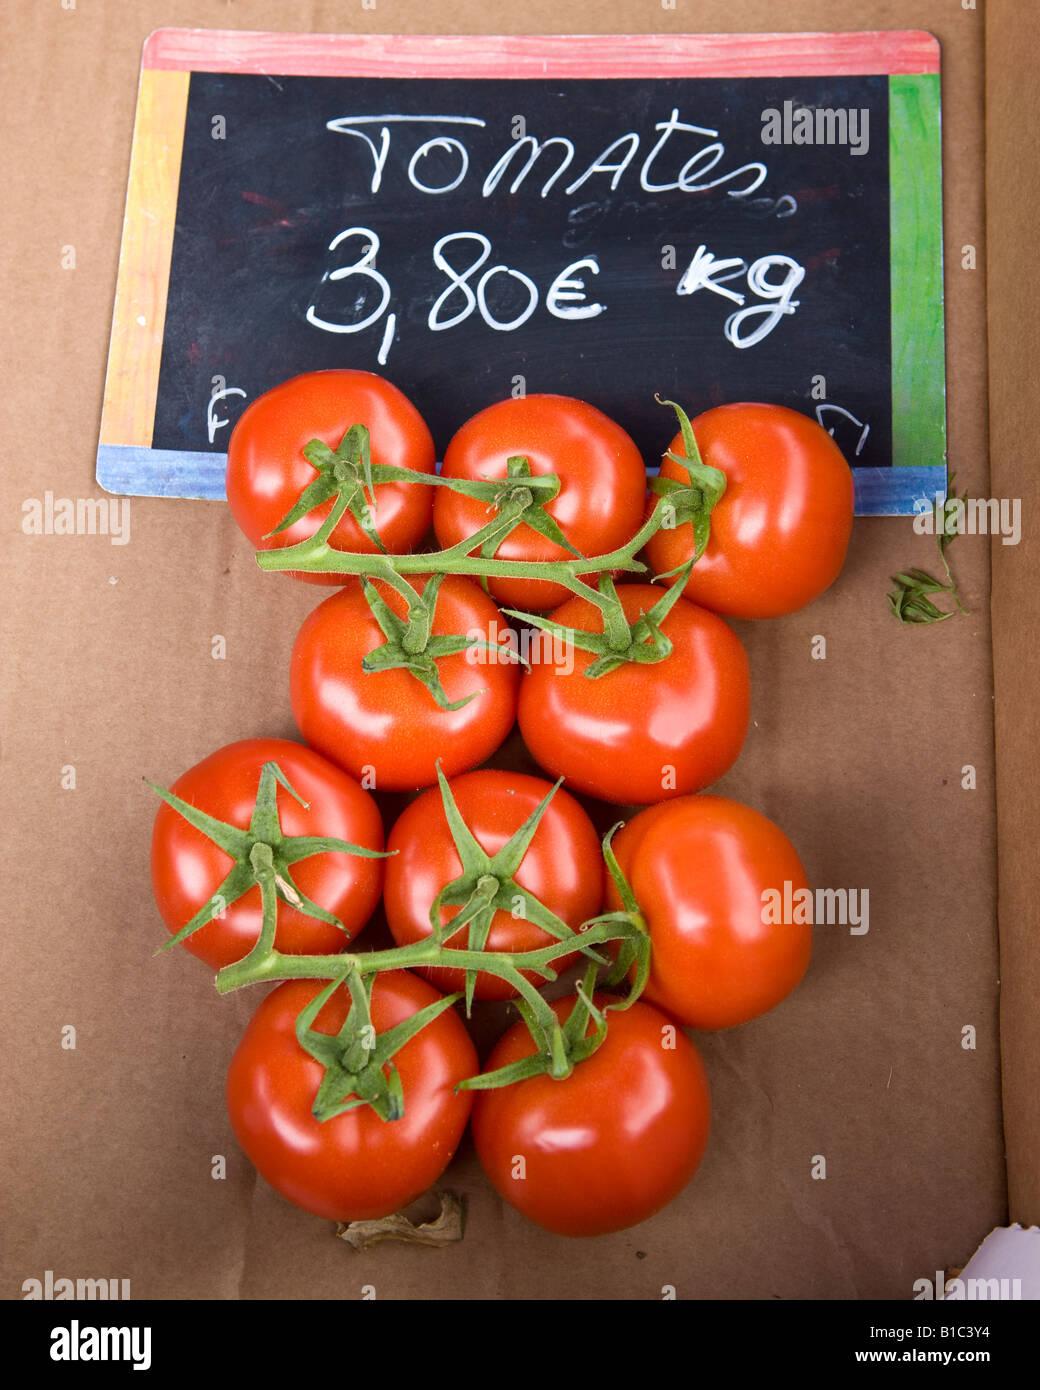 Tomatoes on the Vine priced in Euros per Kilo - Stock Image